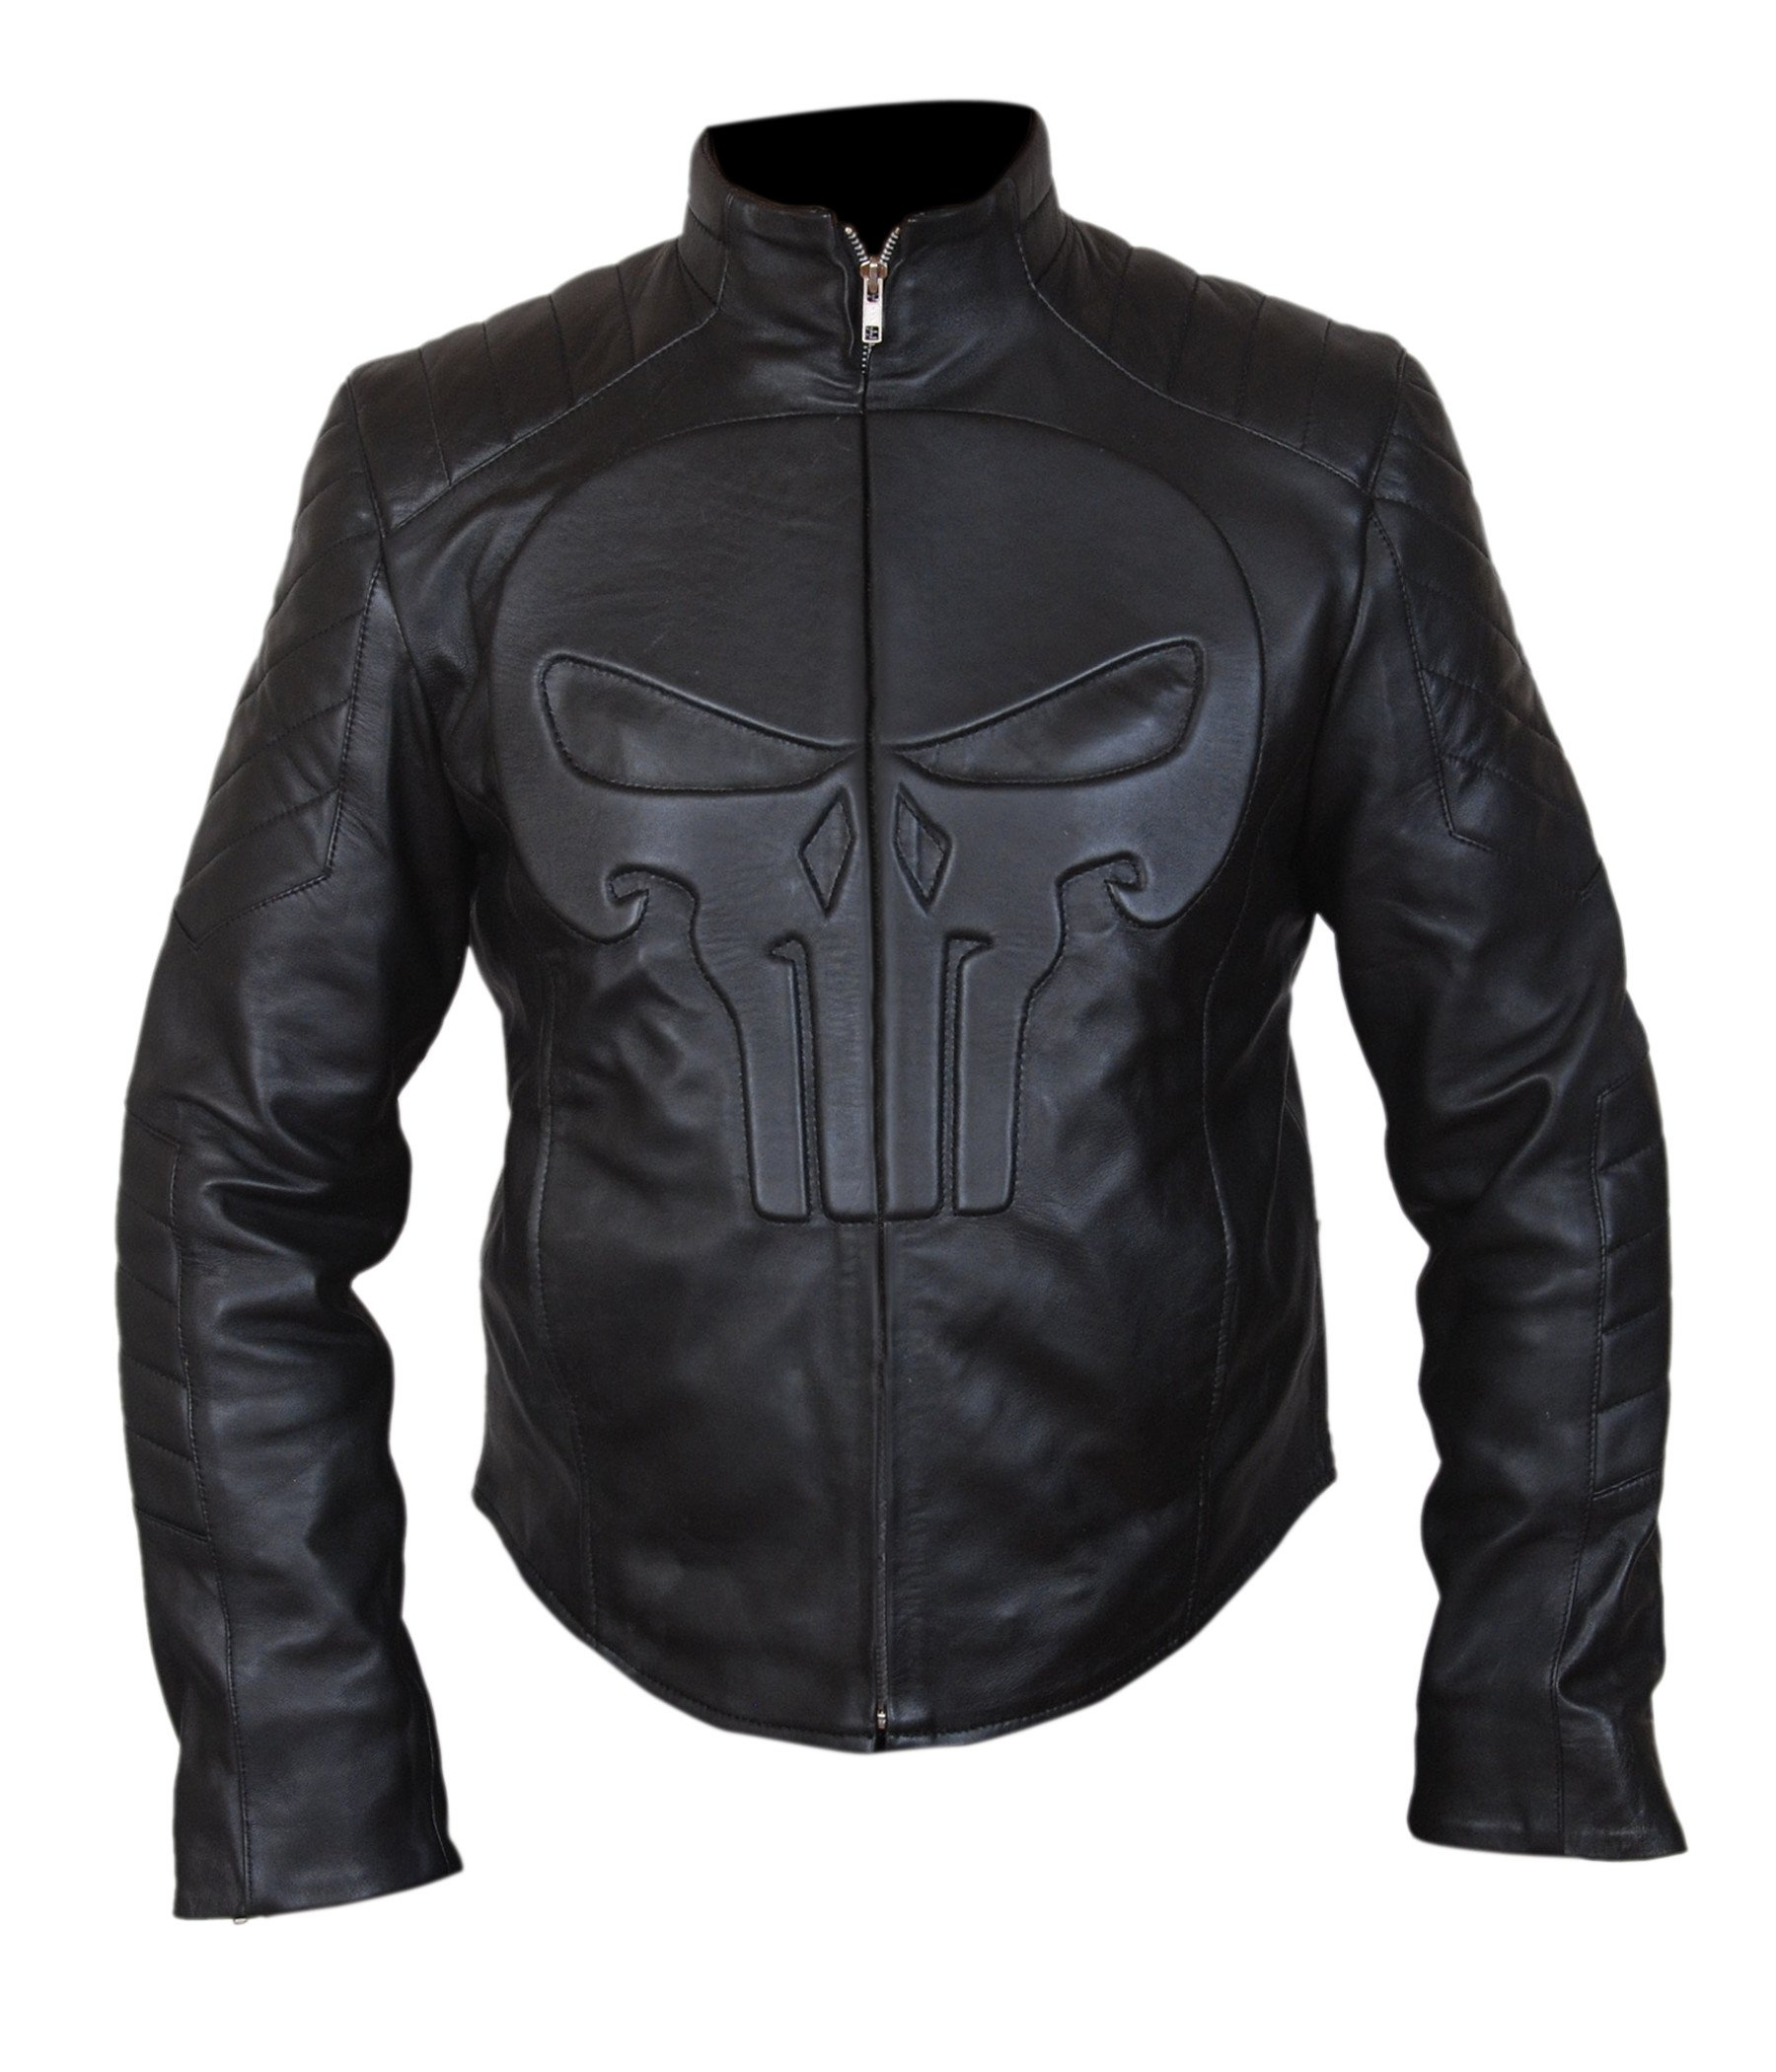 F&H Boy's Punisher Skull Biker Jacket M Black by Flesh & Hide